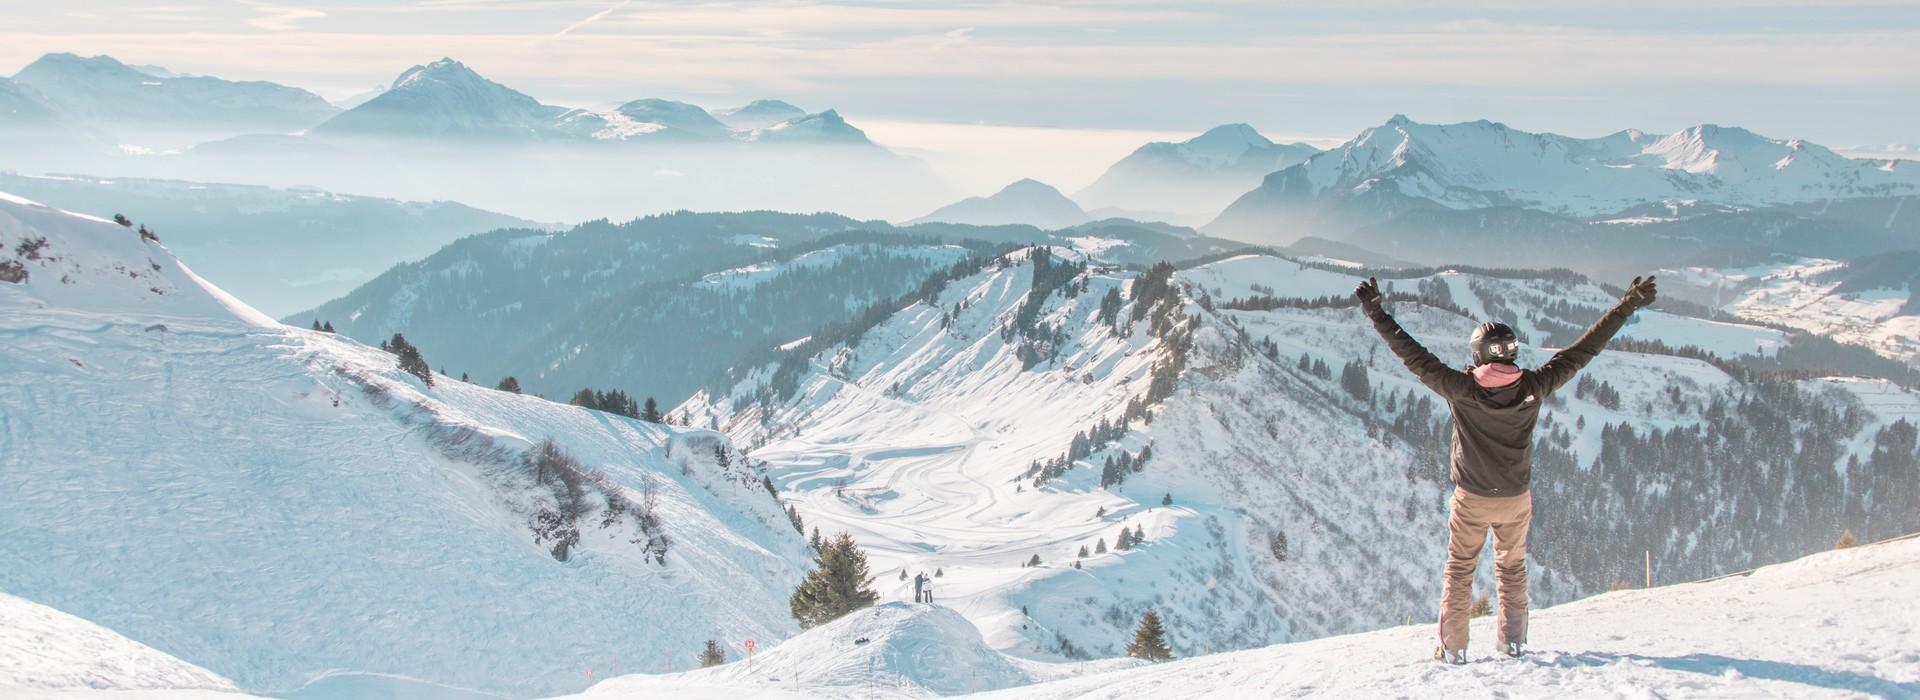 hiver-morzine-2019-2275